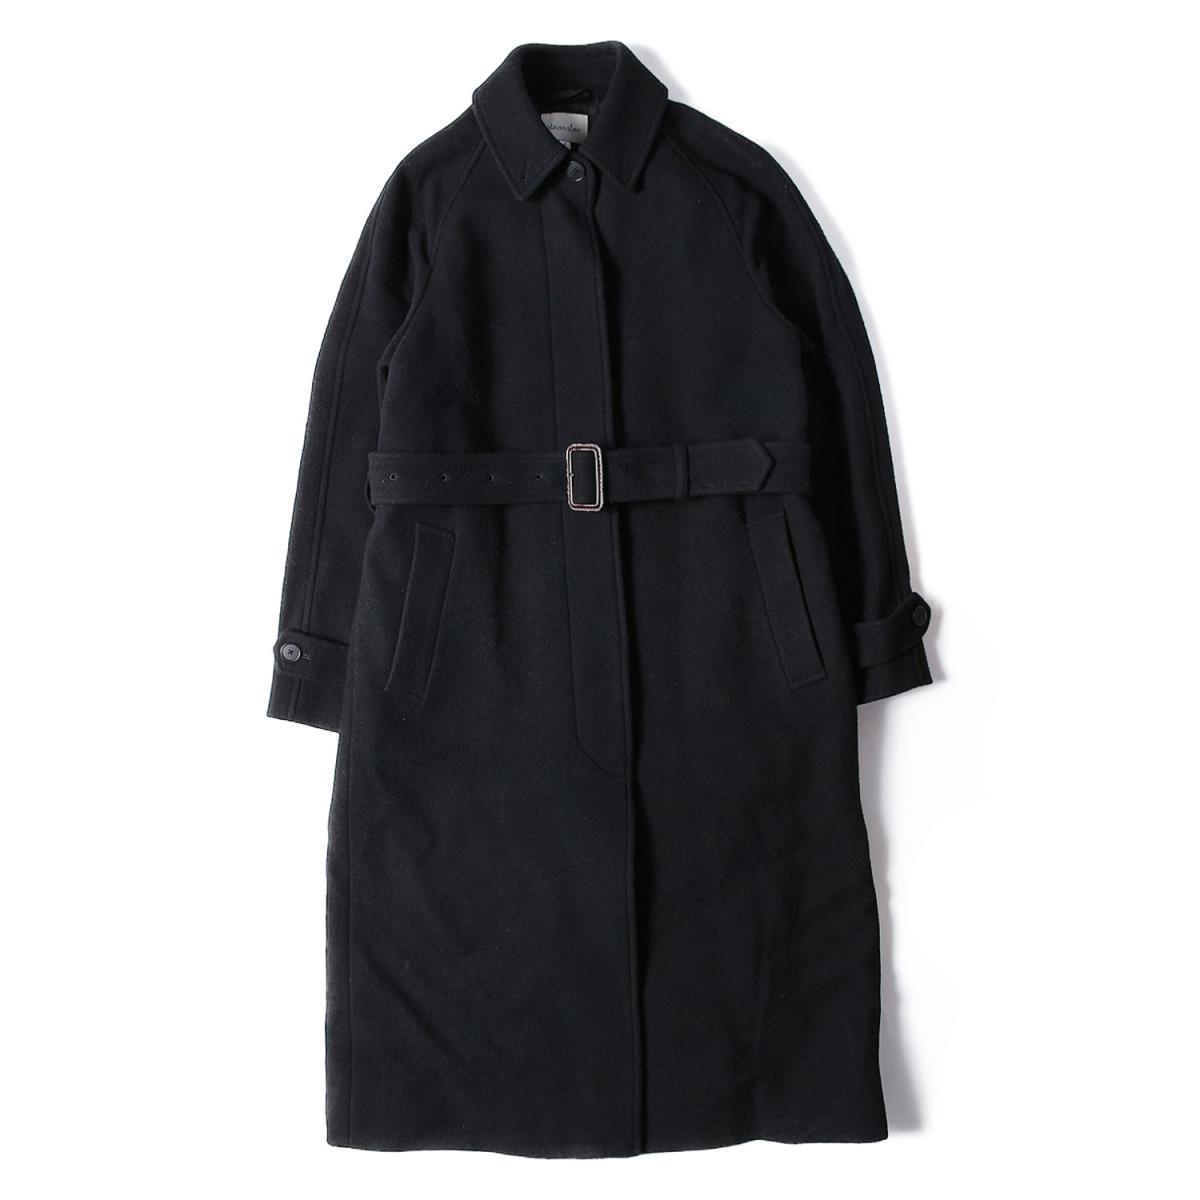 STEVEN ALAN スティーブンアラン メルトン ロング ステンカラー コート ブラック 【レディース】【中古】【K2525】